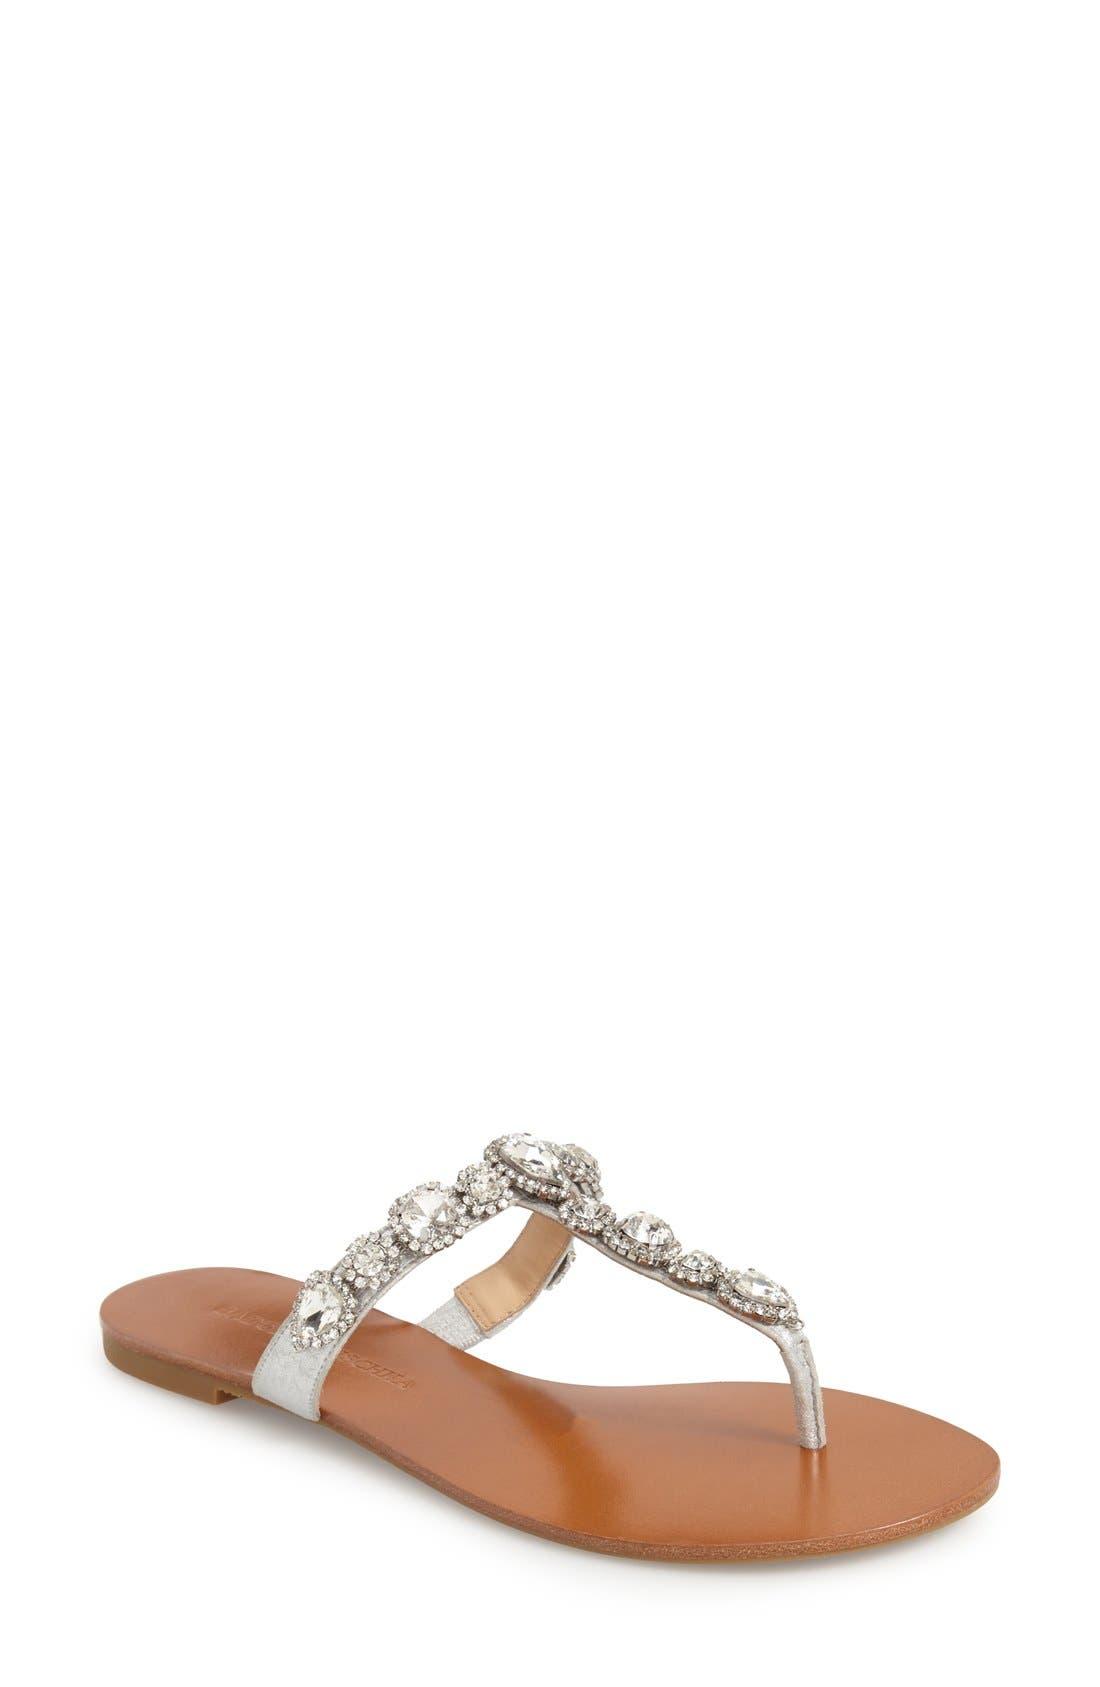 Main Image - Badgley Mischka 'Cliche' Embellished Flat Sandal (Women)